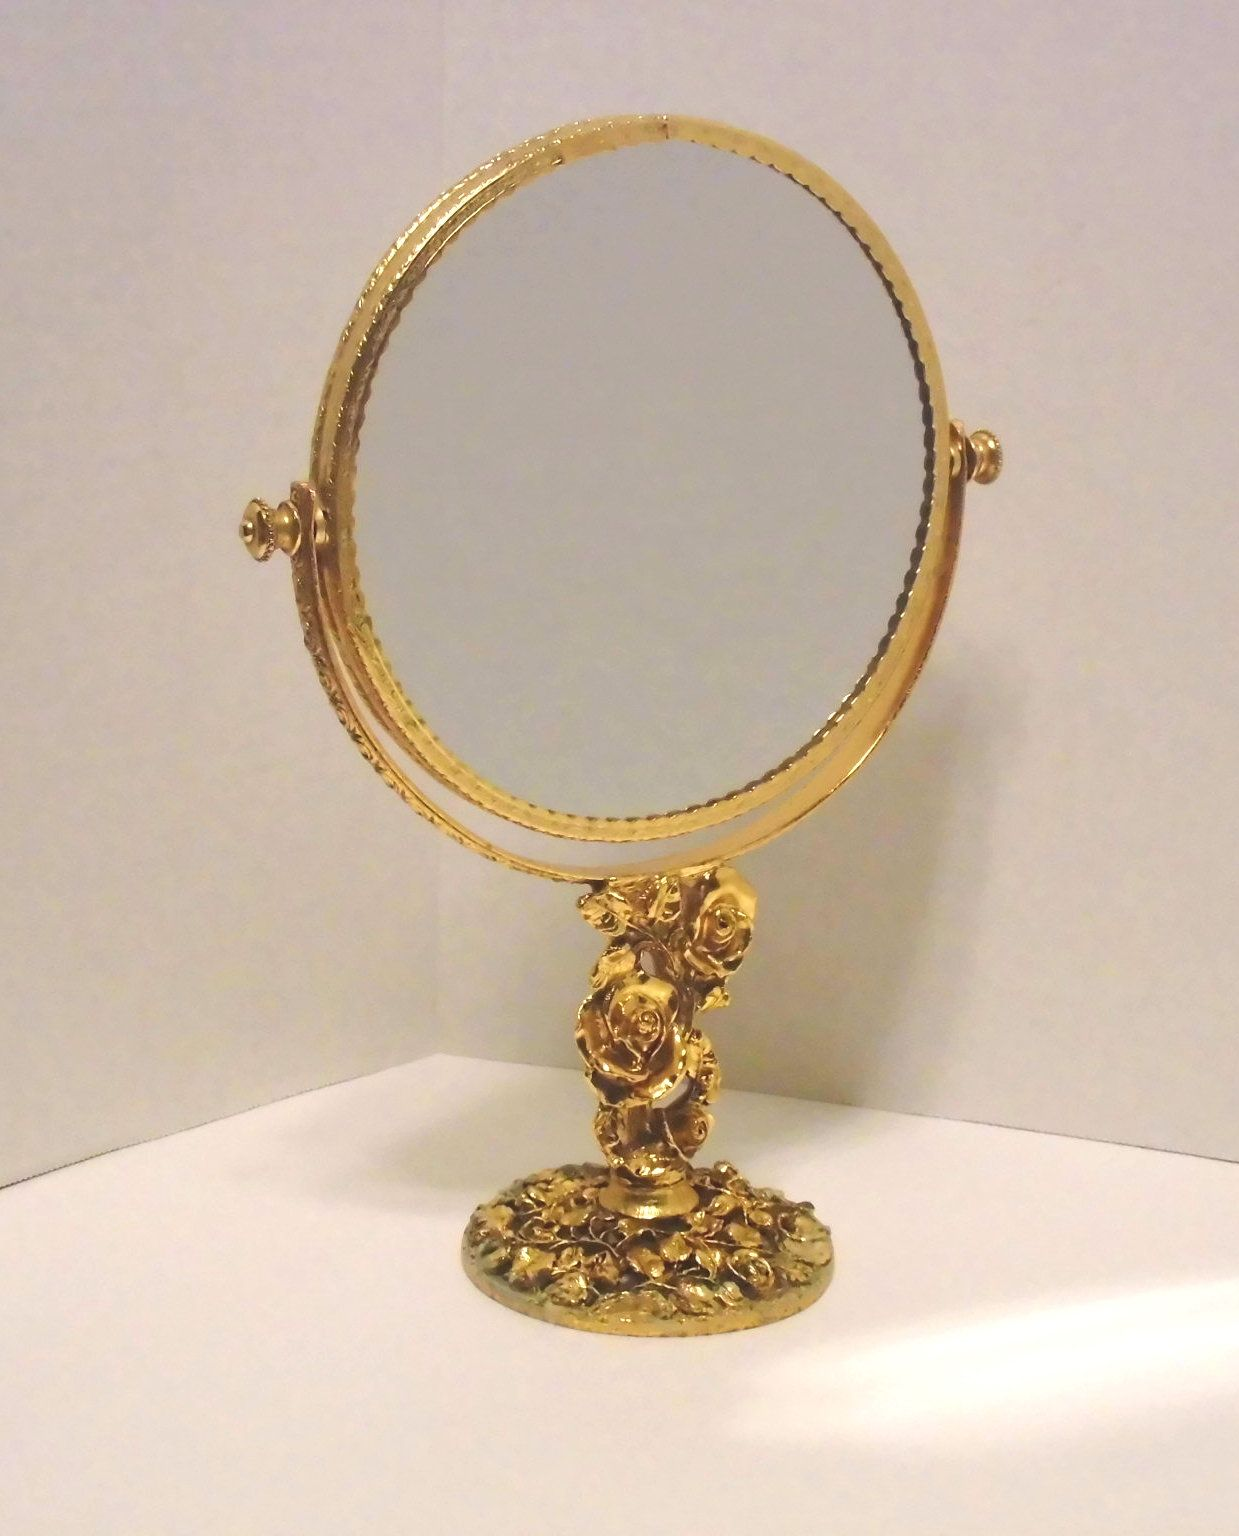 Vintage gold color free standing Stylebuilt brand mirror